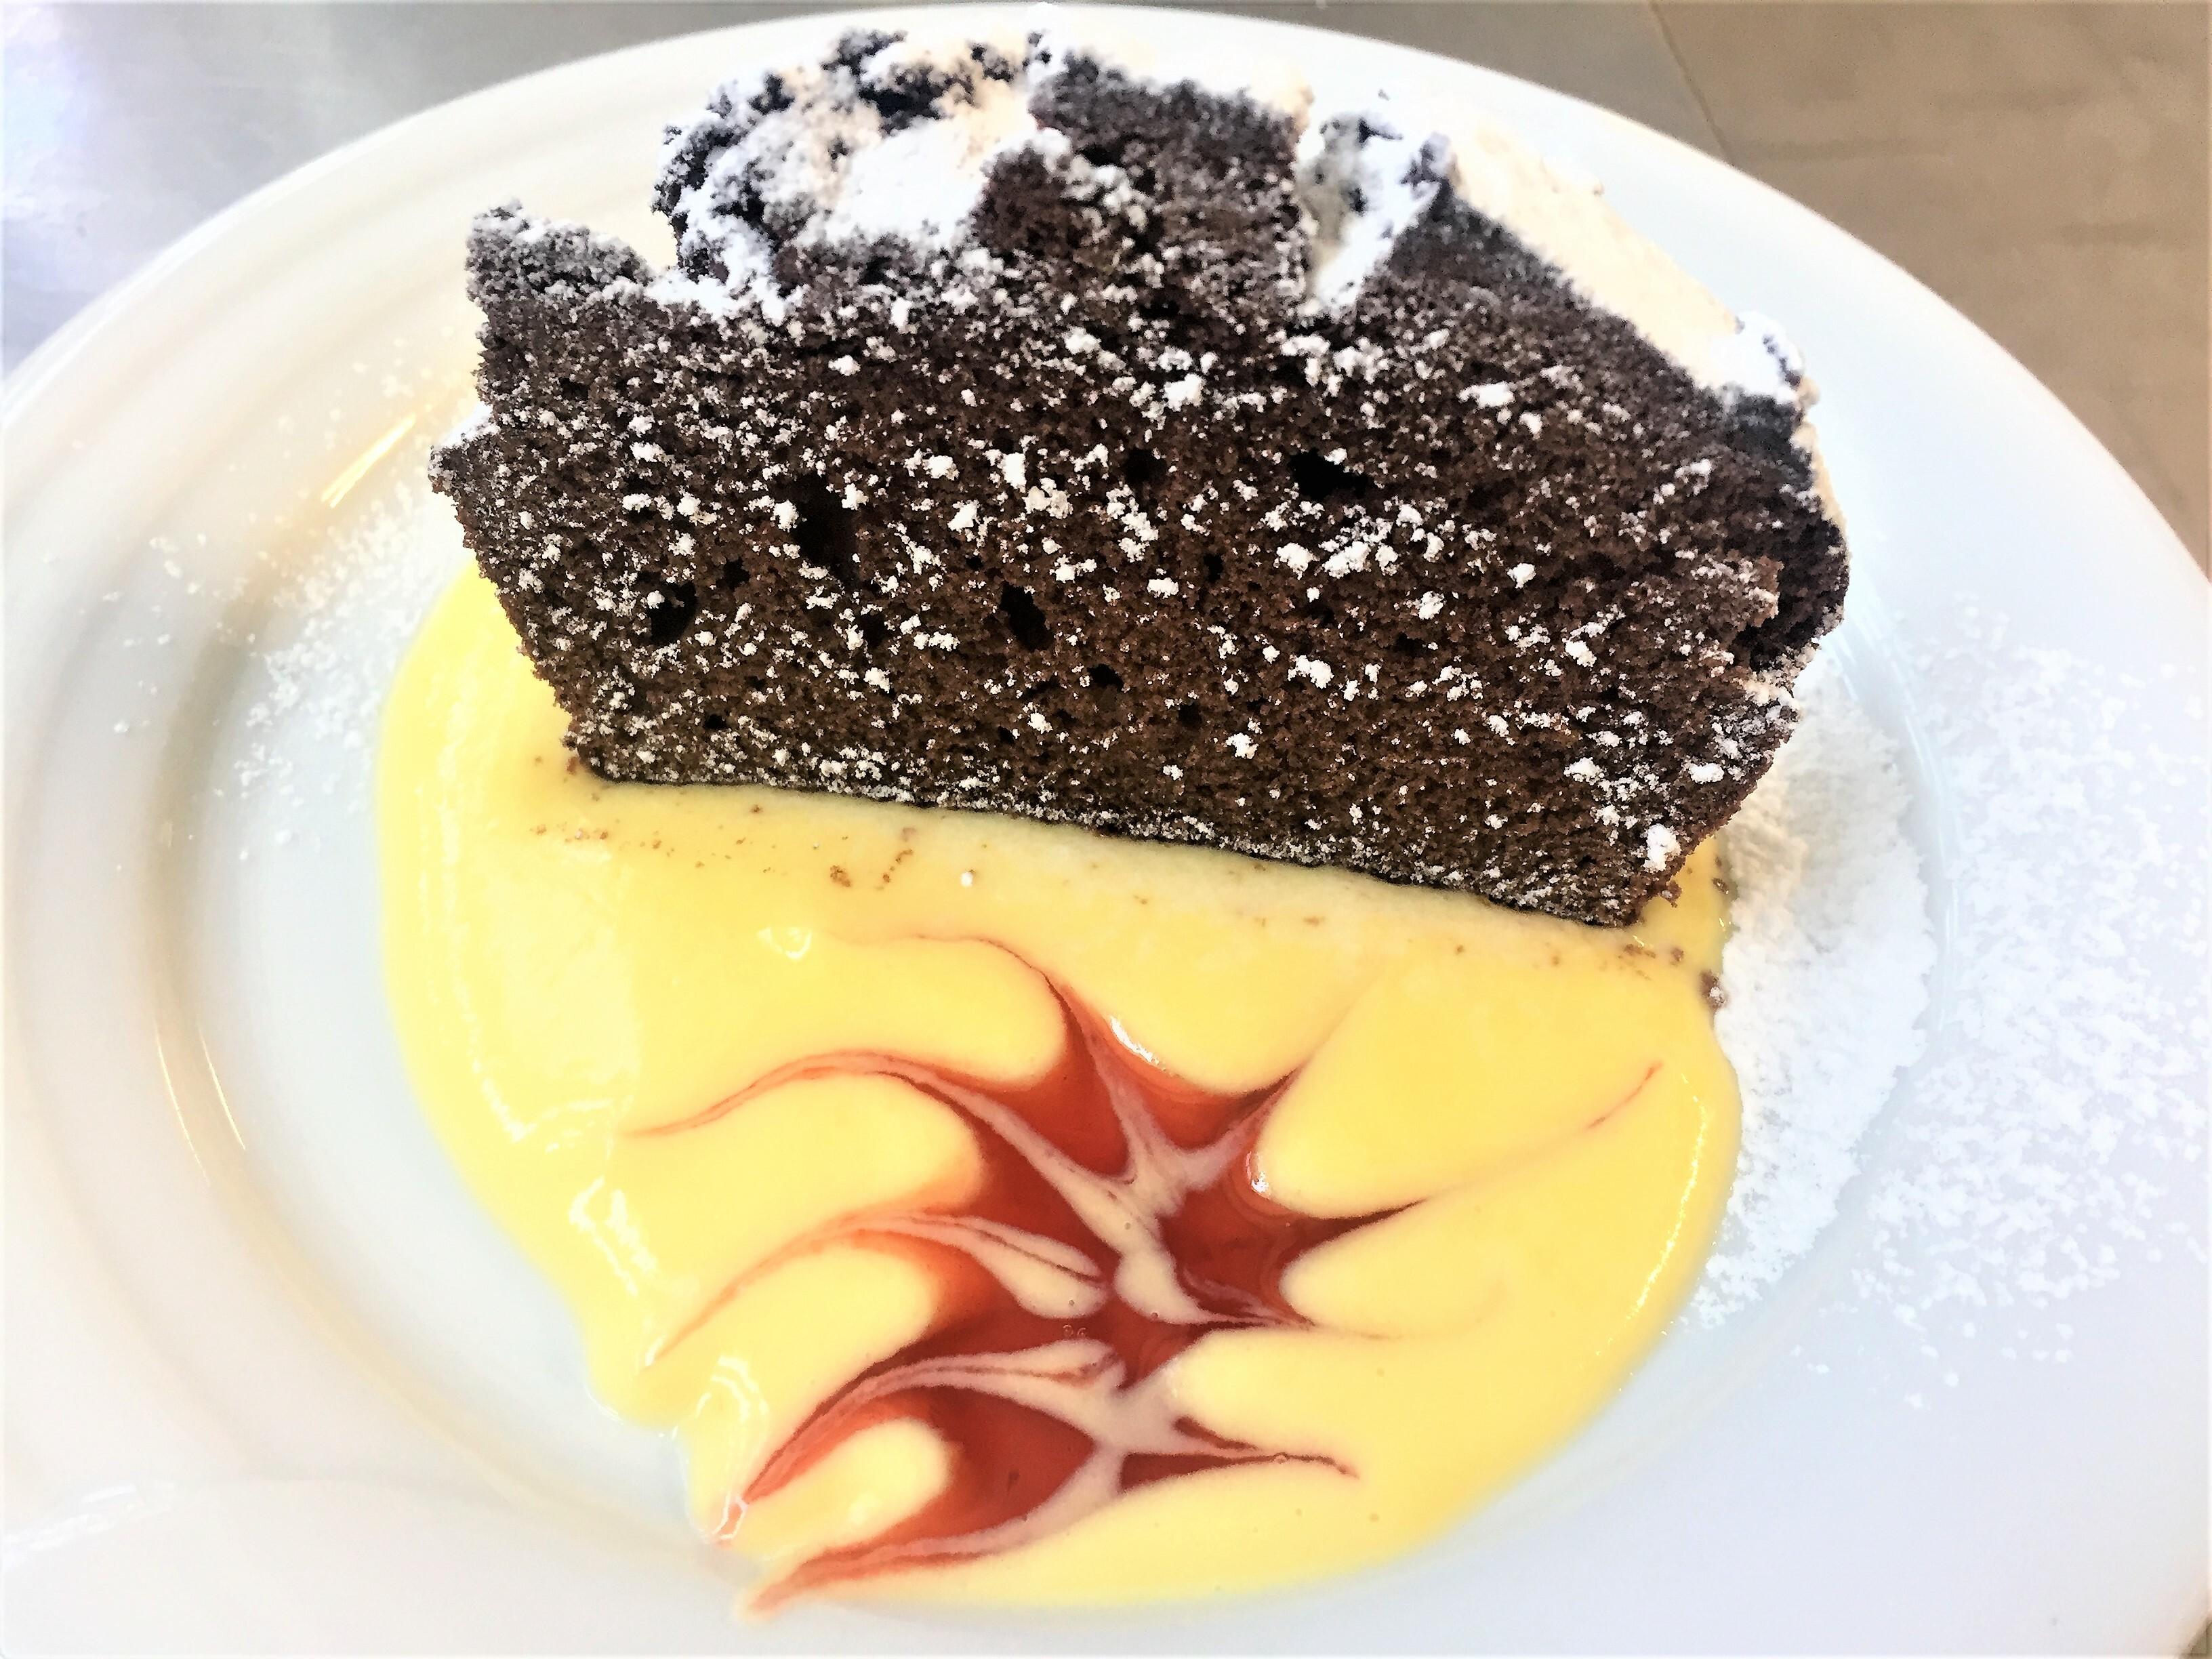 Trancio al cioccolato con crema